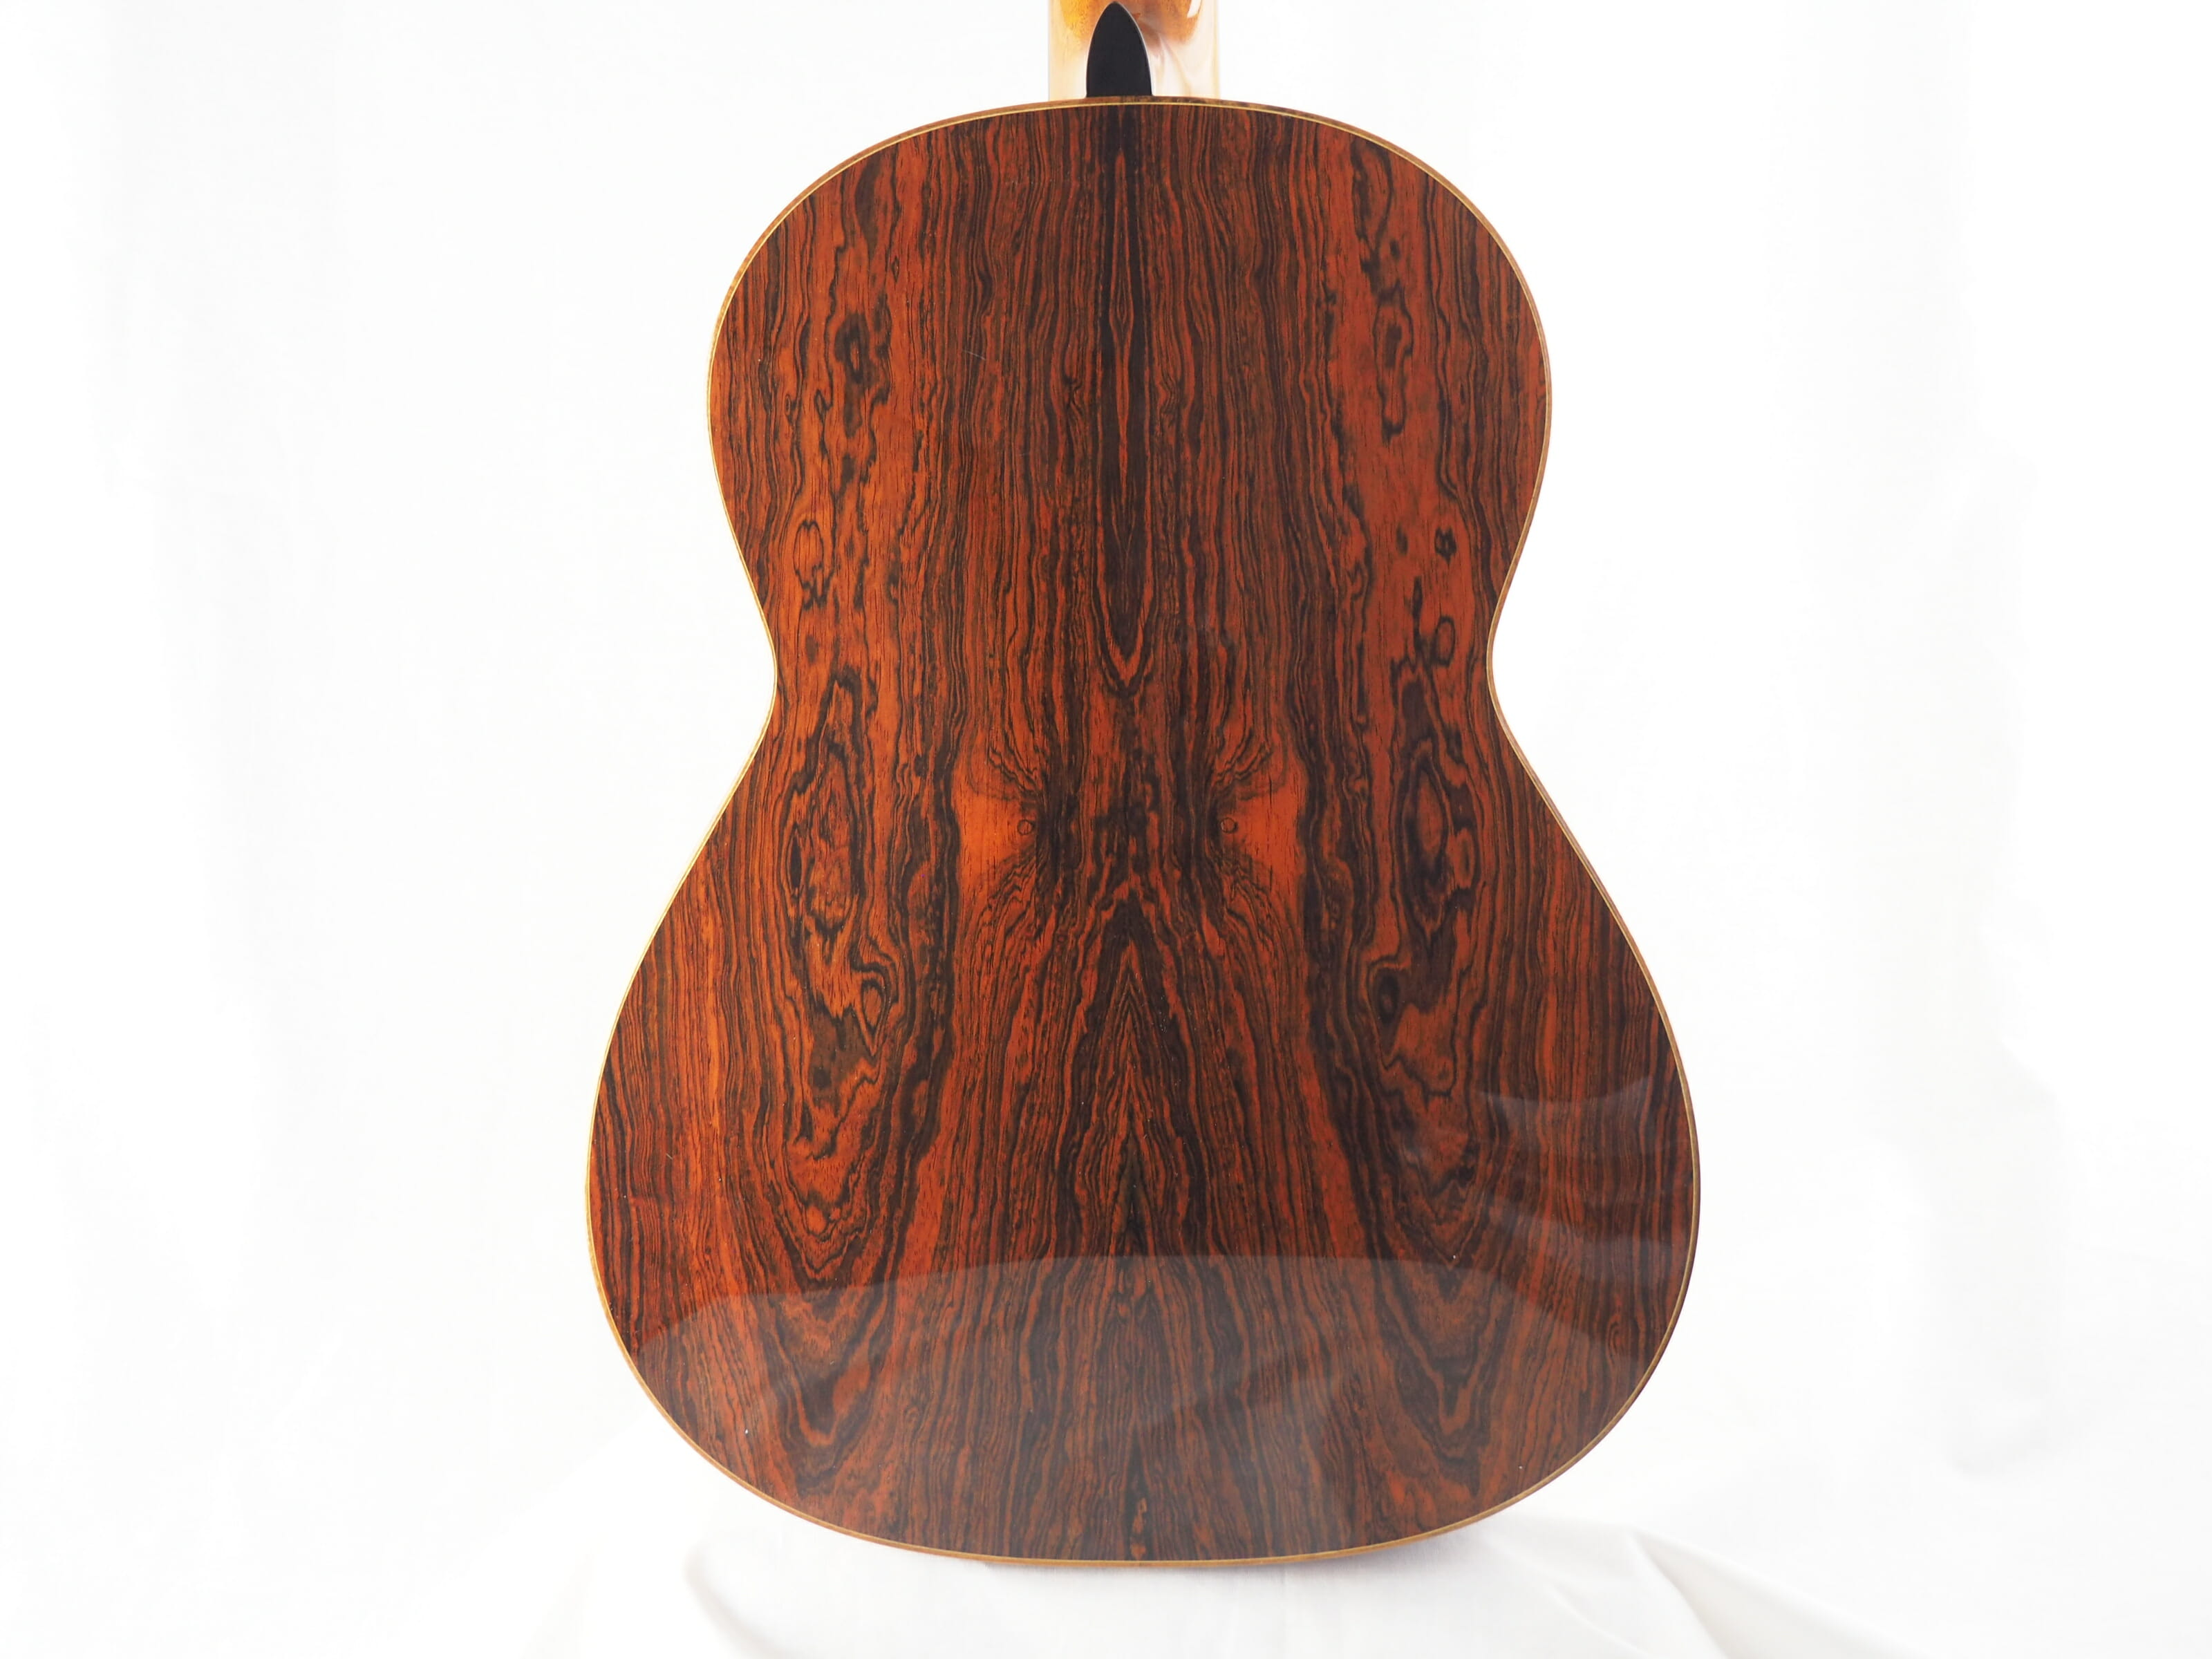 John Price luthier guitare classique No 19PRI348-04